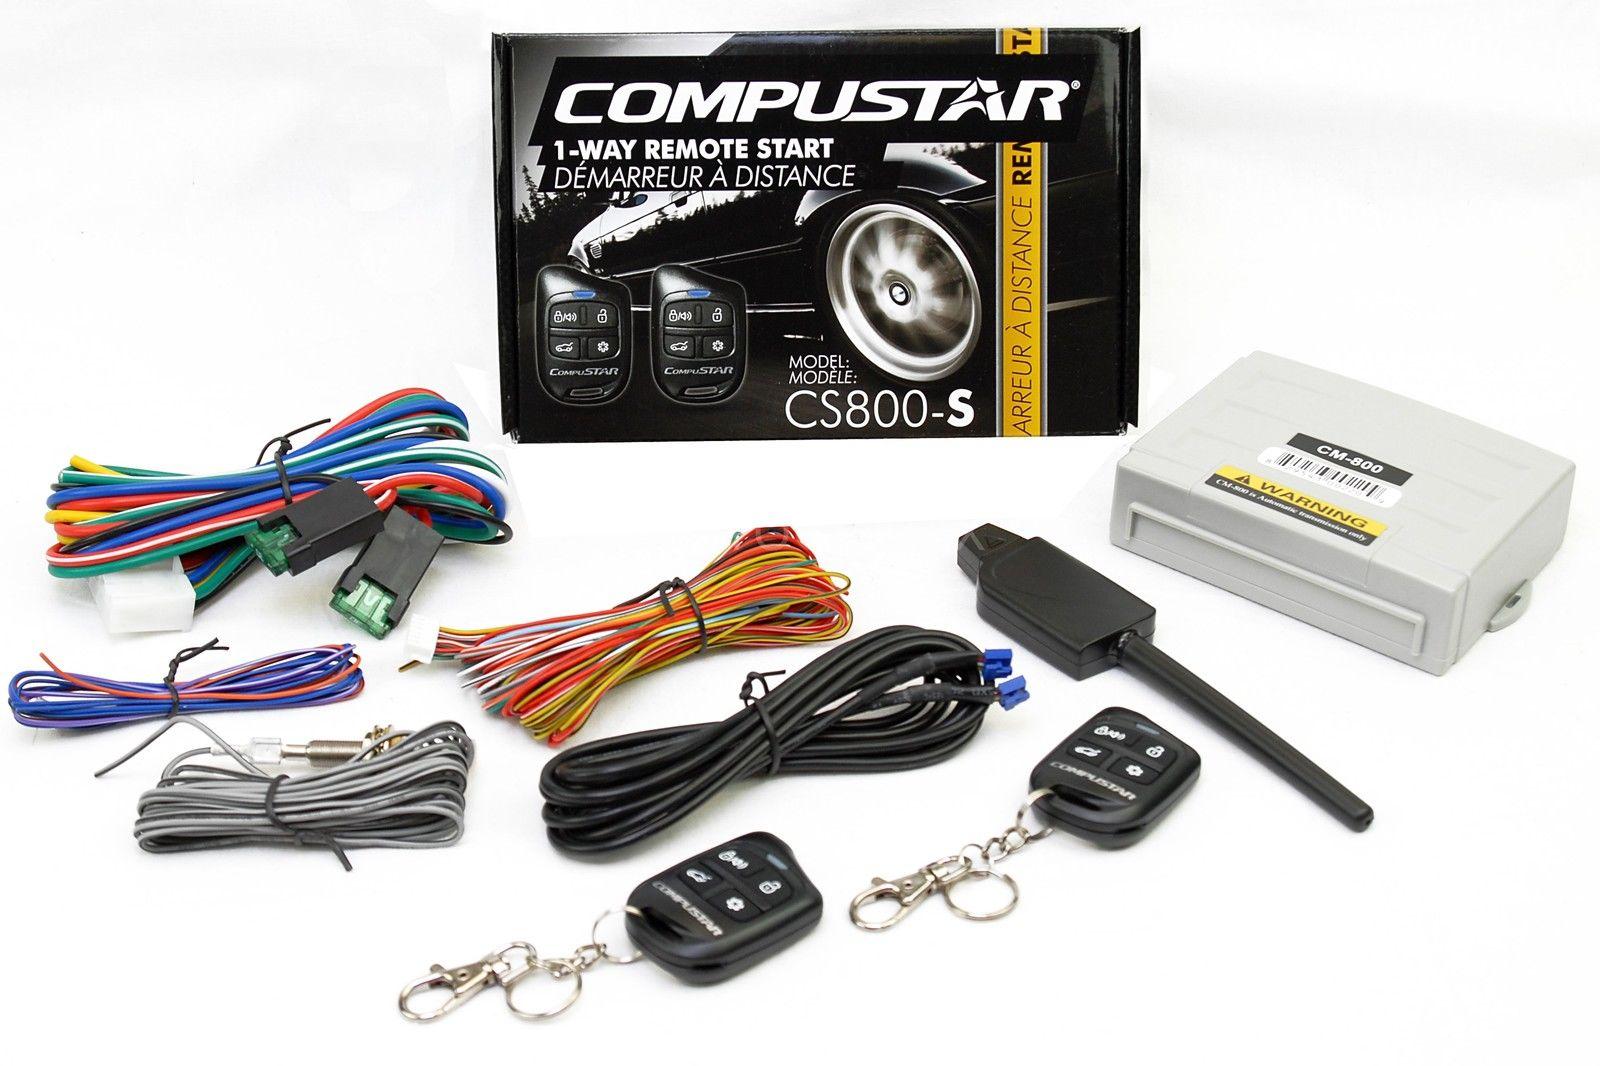 compustar wiring diagram 97 f150 stereo car auto remote start starter w keyless entry